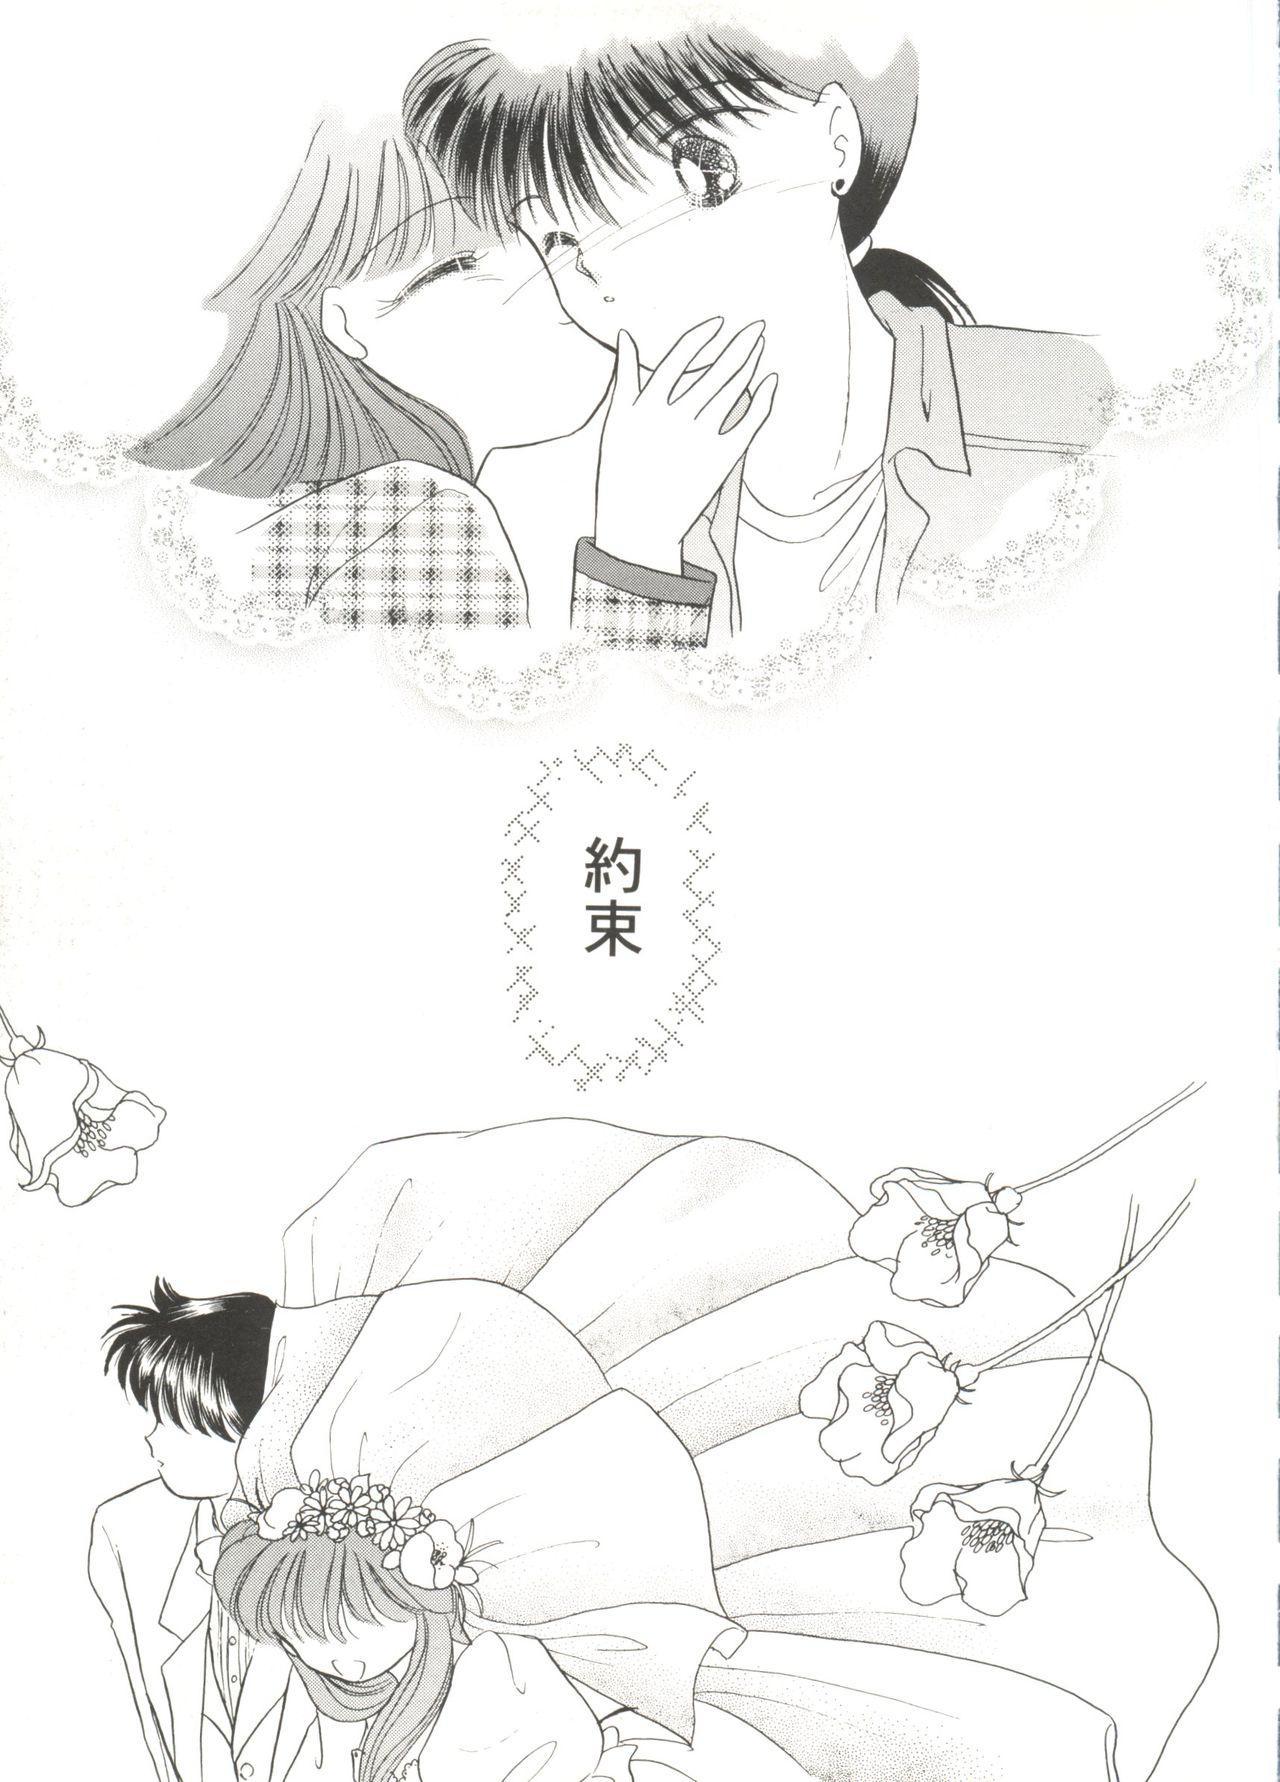 Bishoujo Doujin Peach Club - Pretty Gal's Fanzine Peach Club 9 106